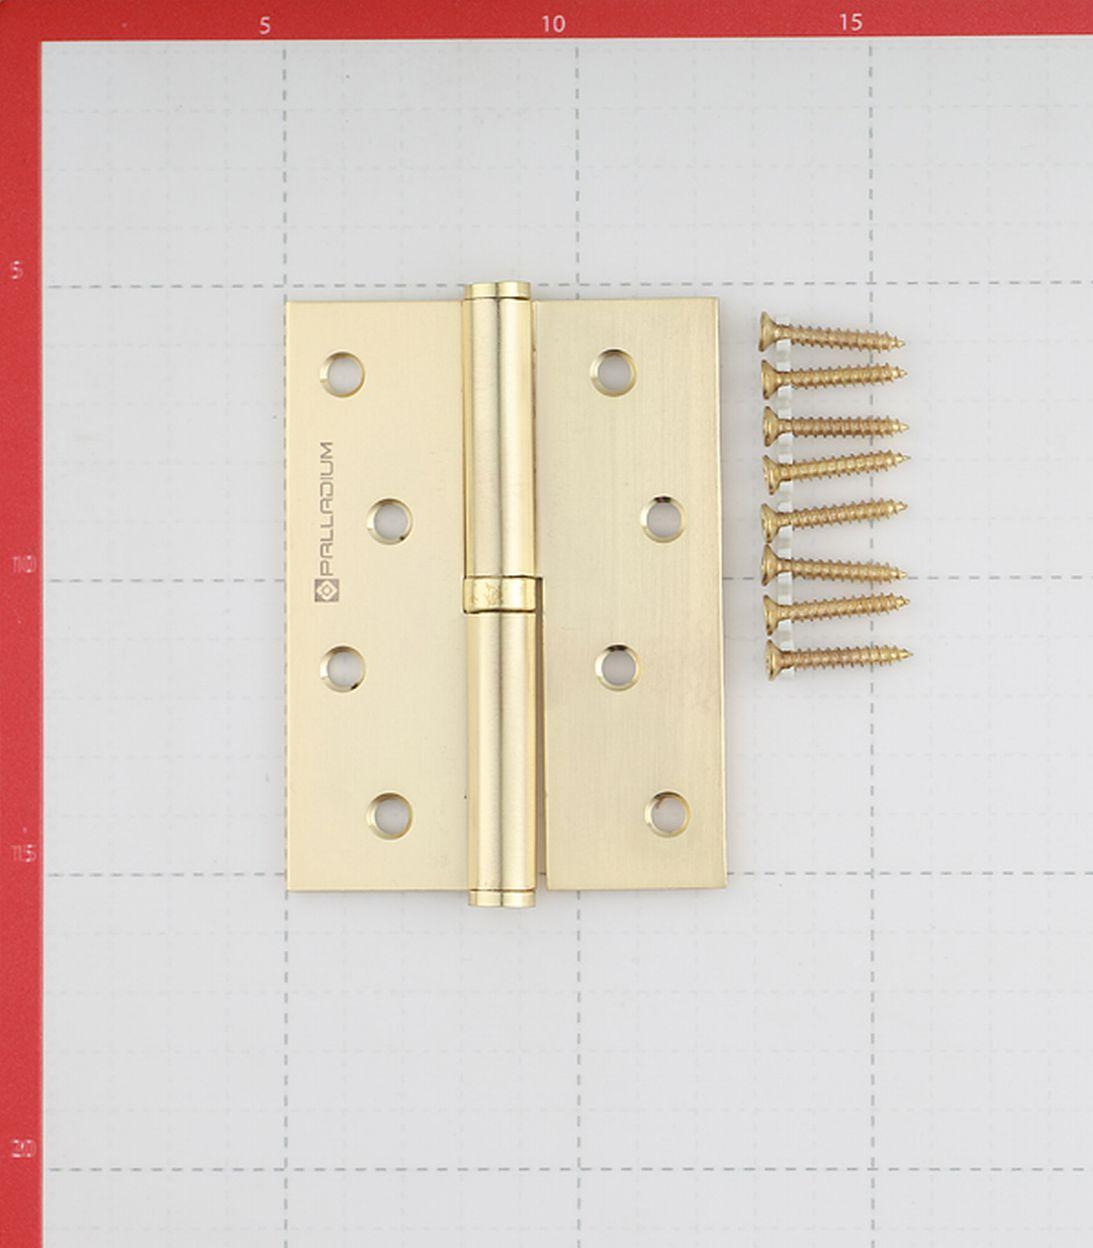 Петля Palladium N 613-S-4 SB правая разъемная 100х75 мм матовая латунь